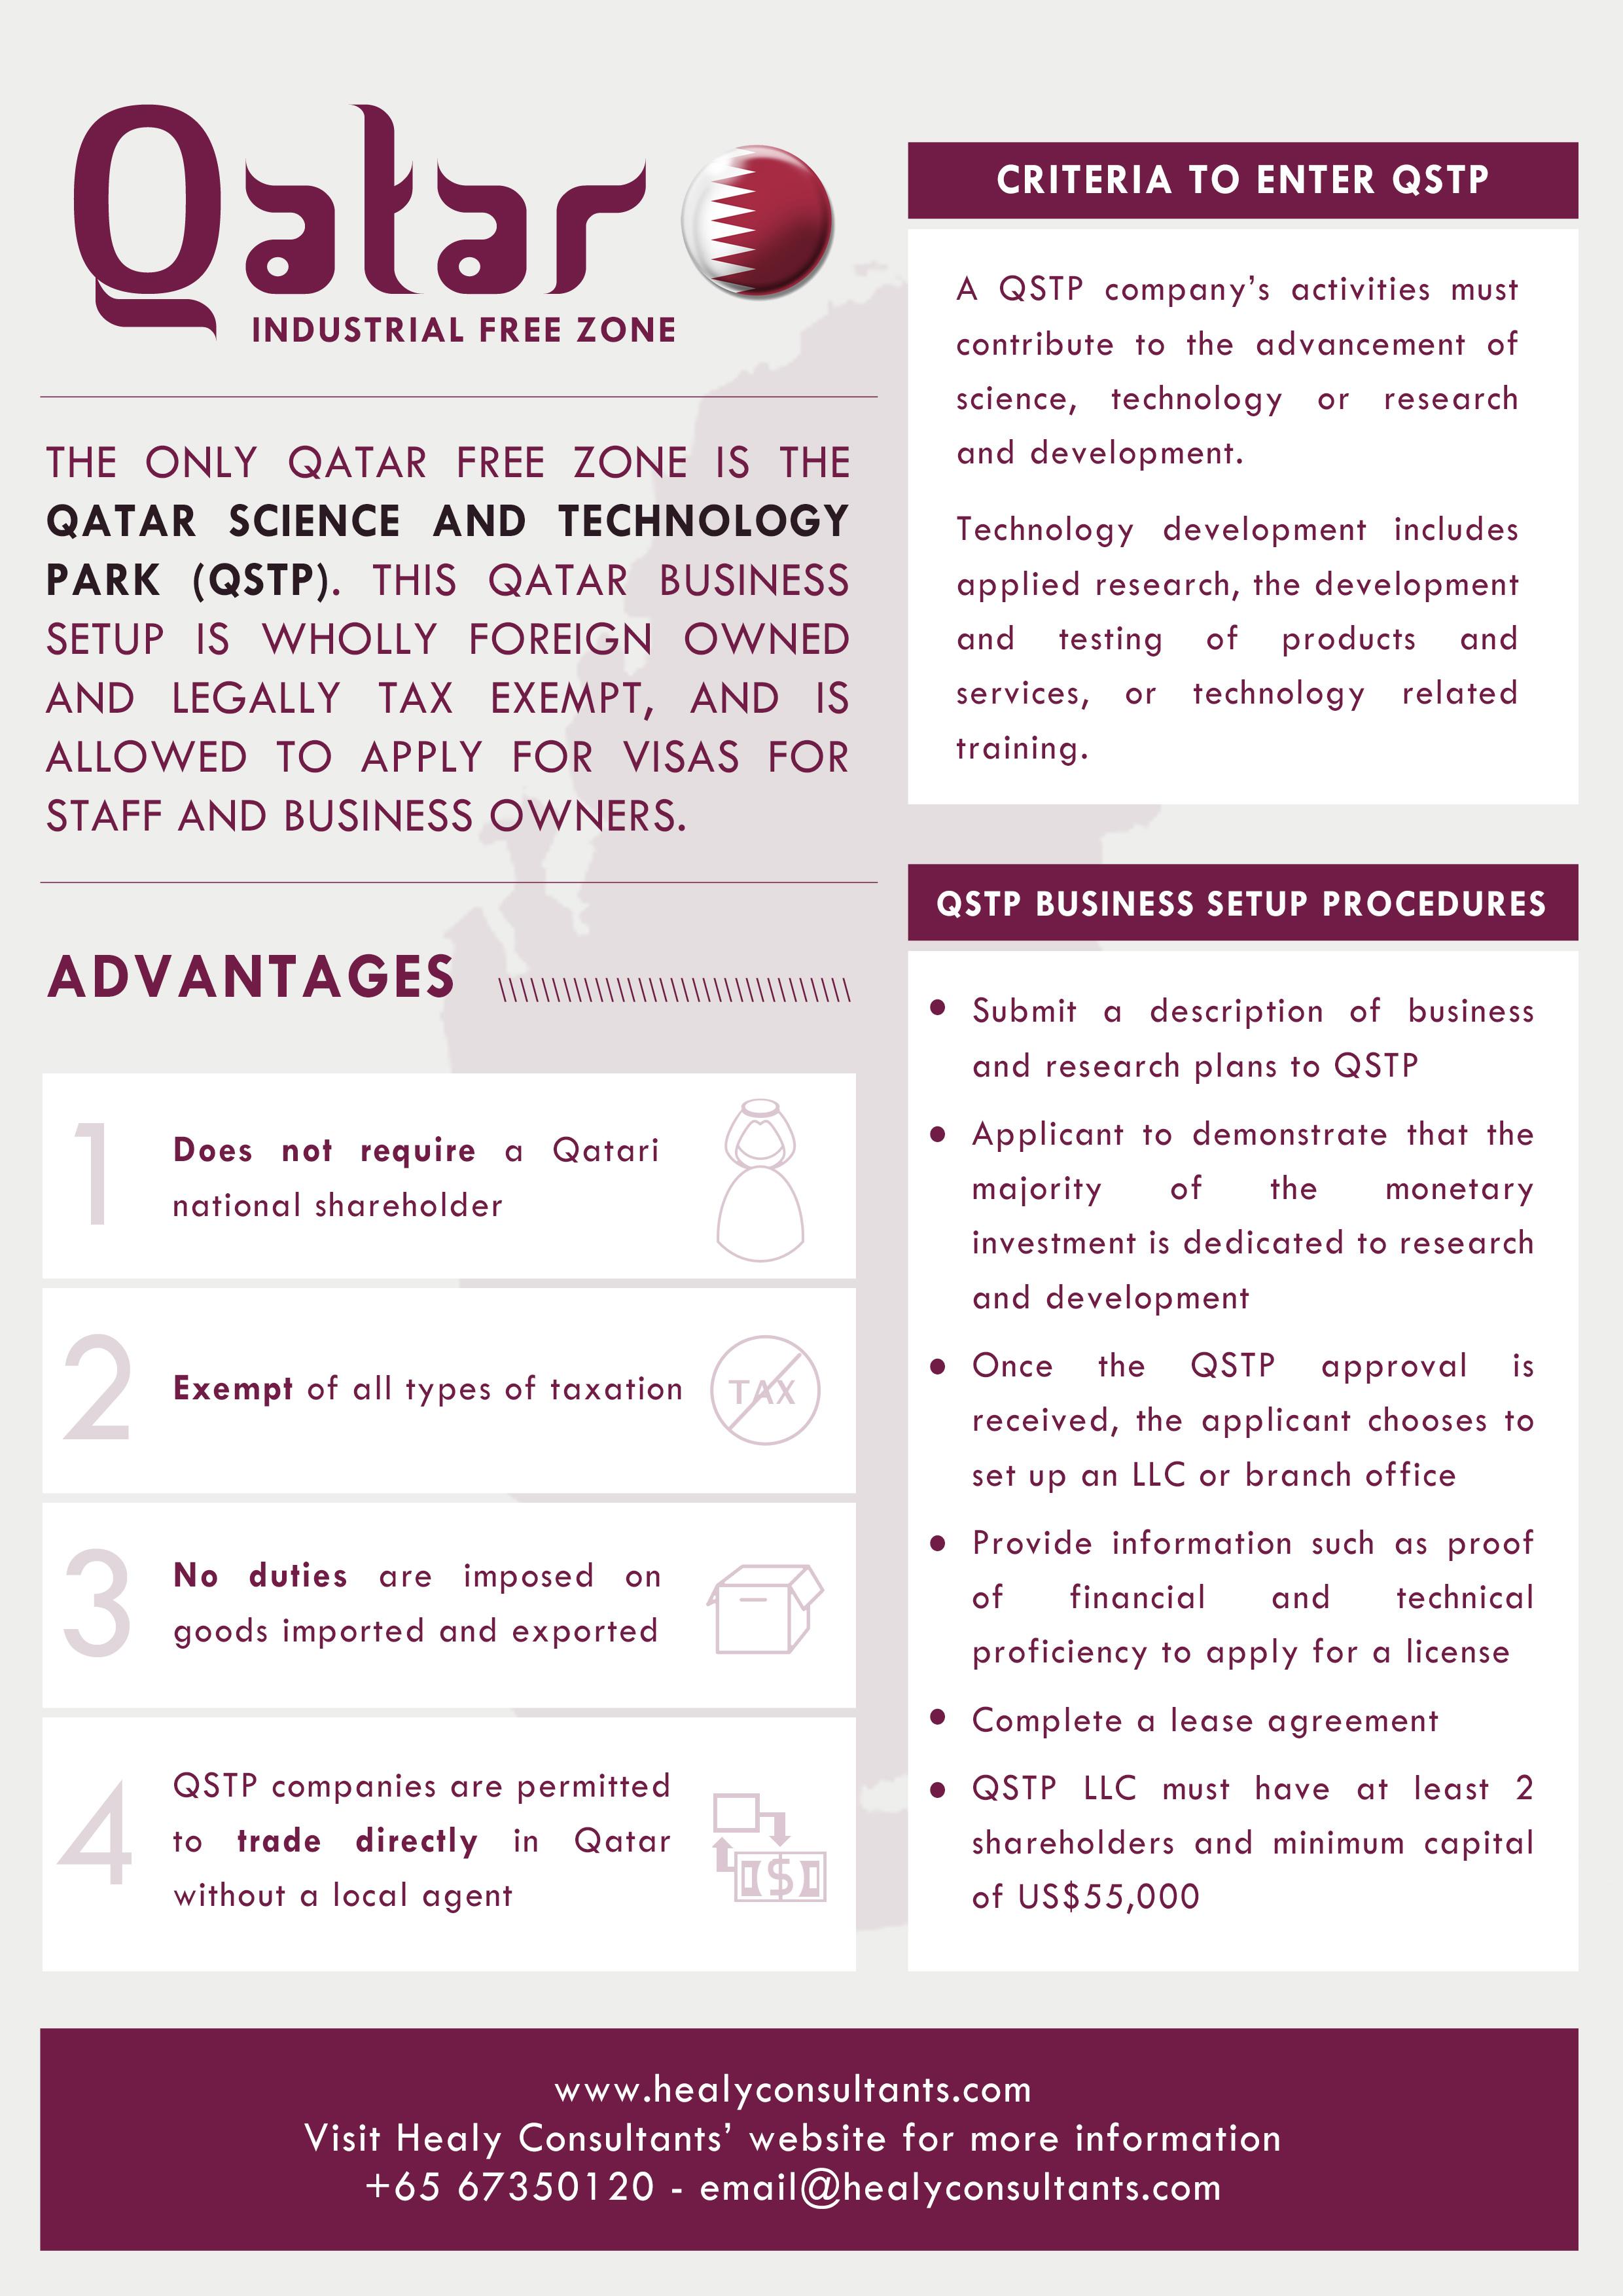 Qatar free zone (QSTP) guides